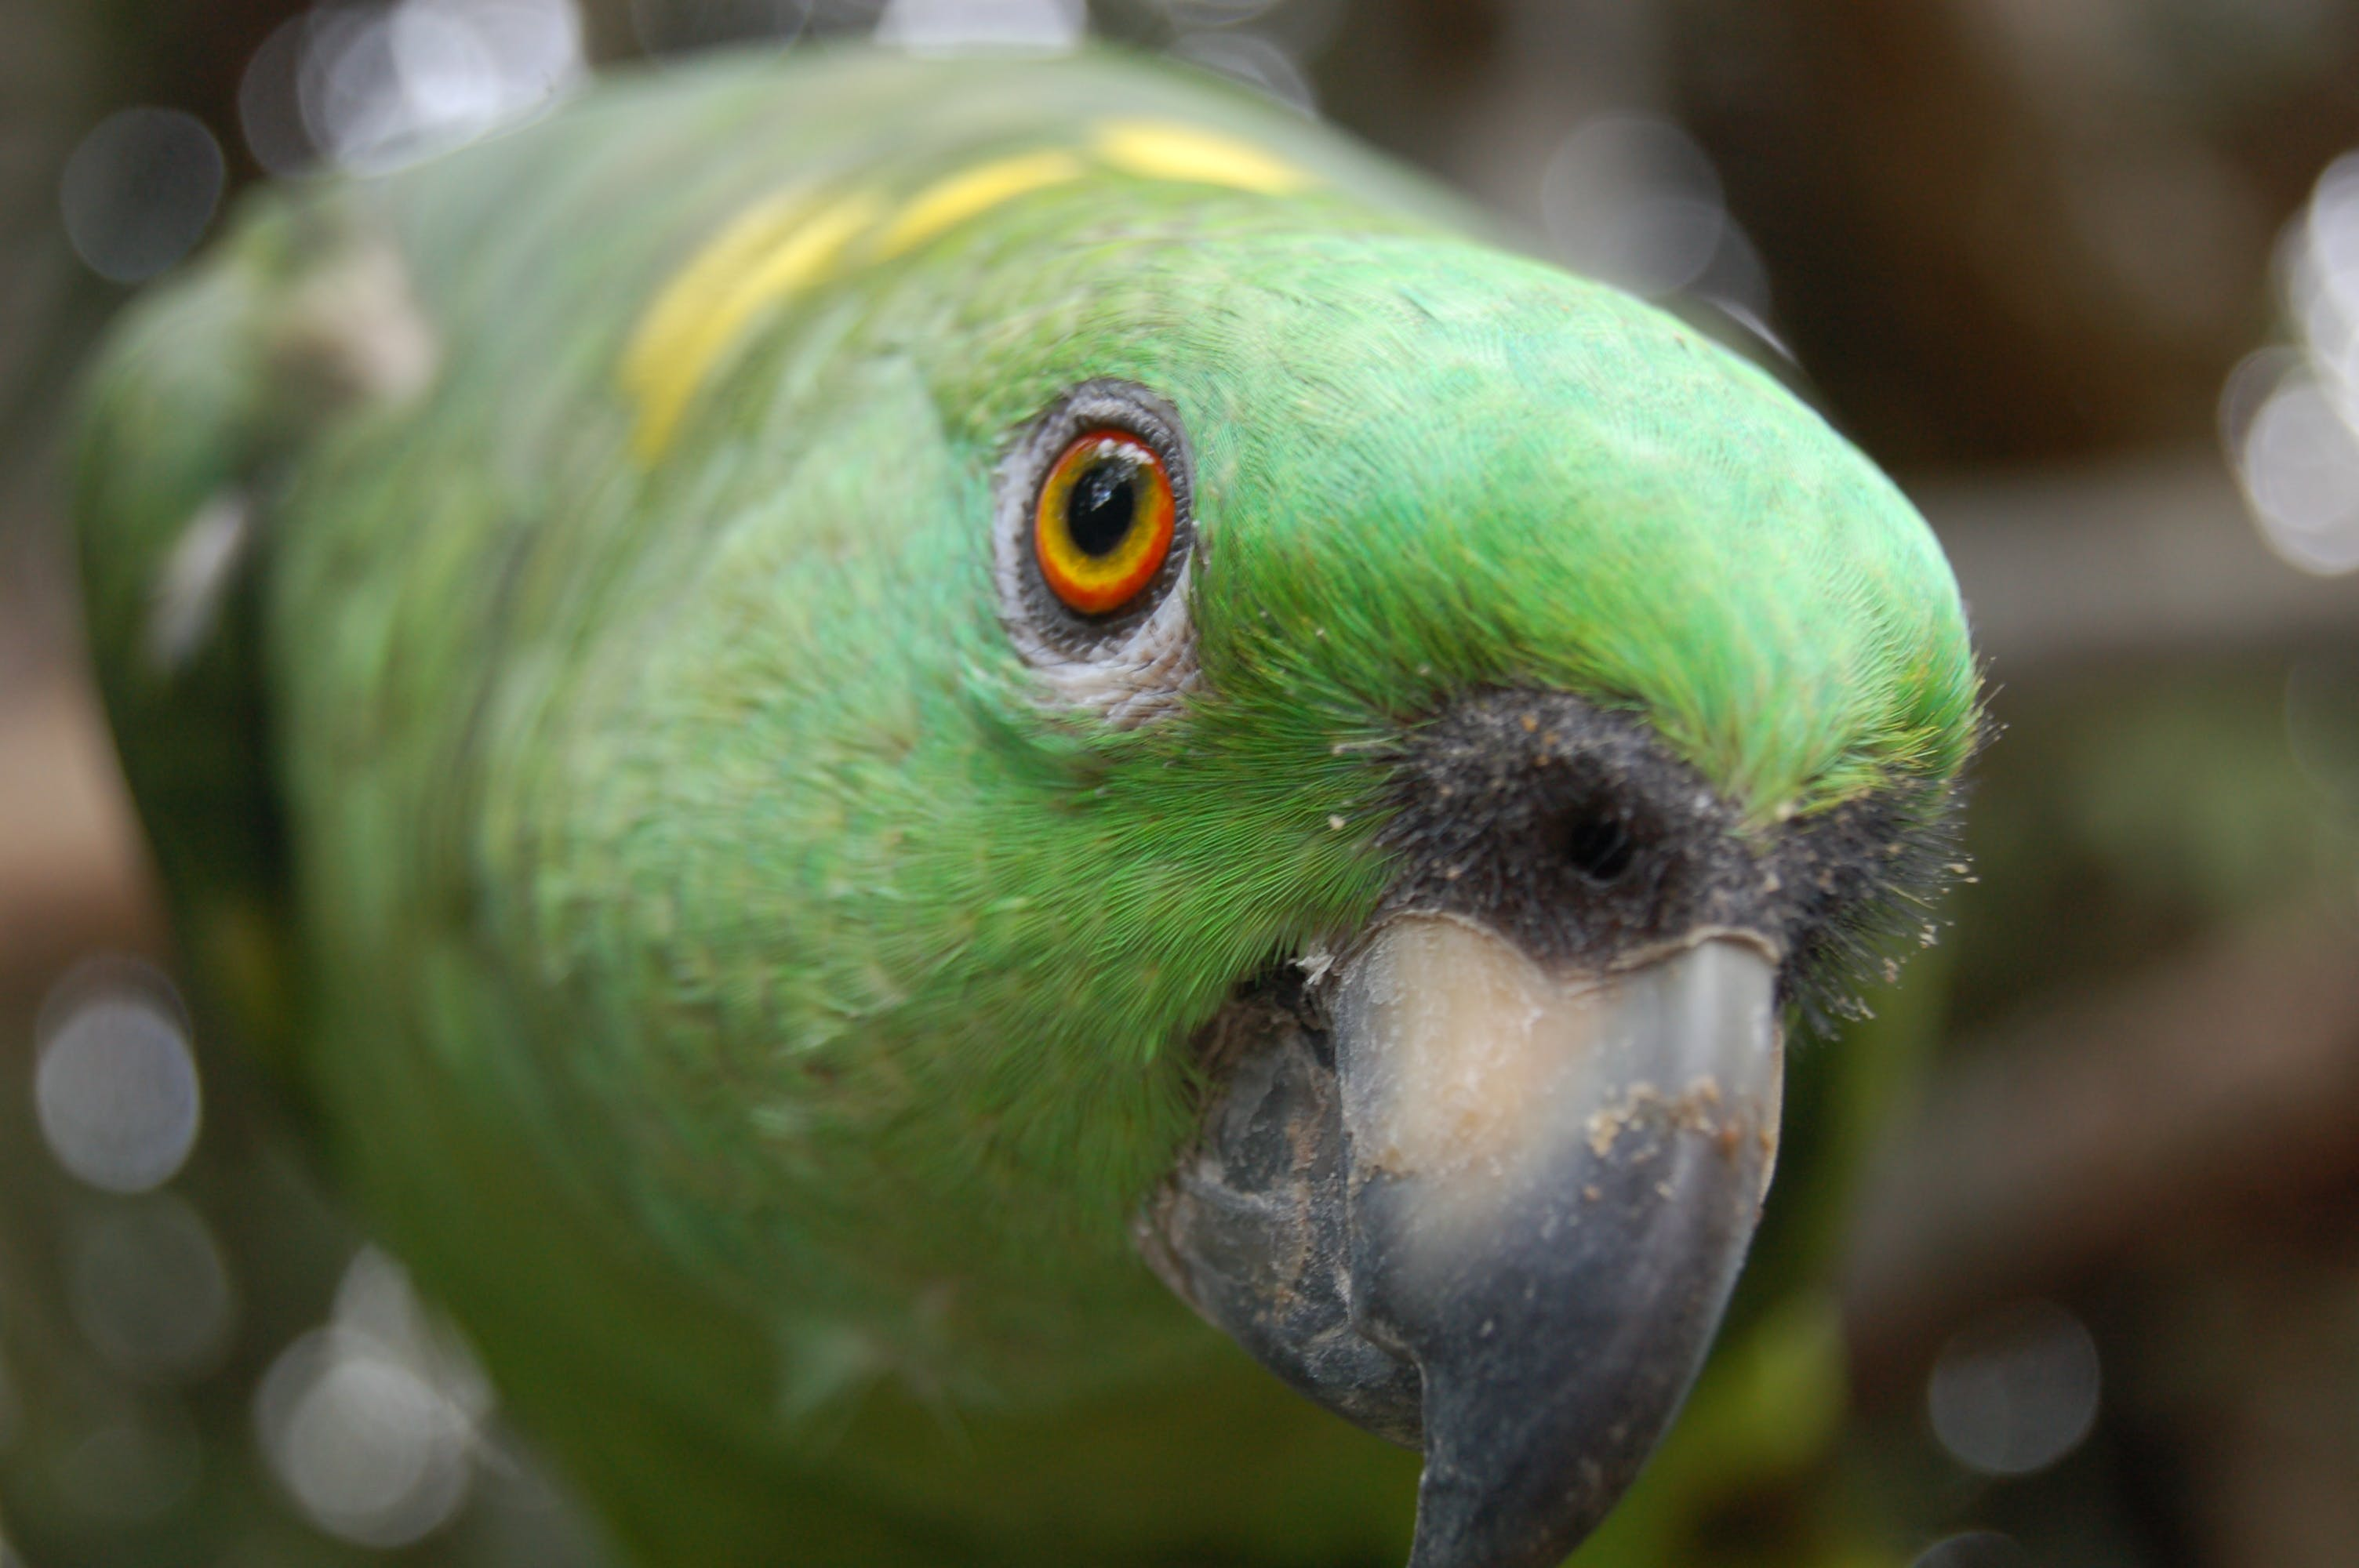 Evcil Hayvan, güzel, hayvan, papağan içeren Ücretsiz stok fotoğraf